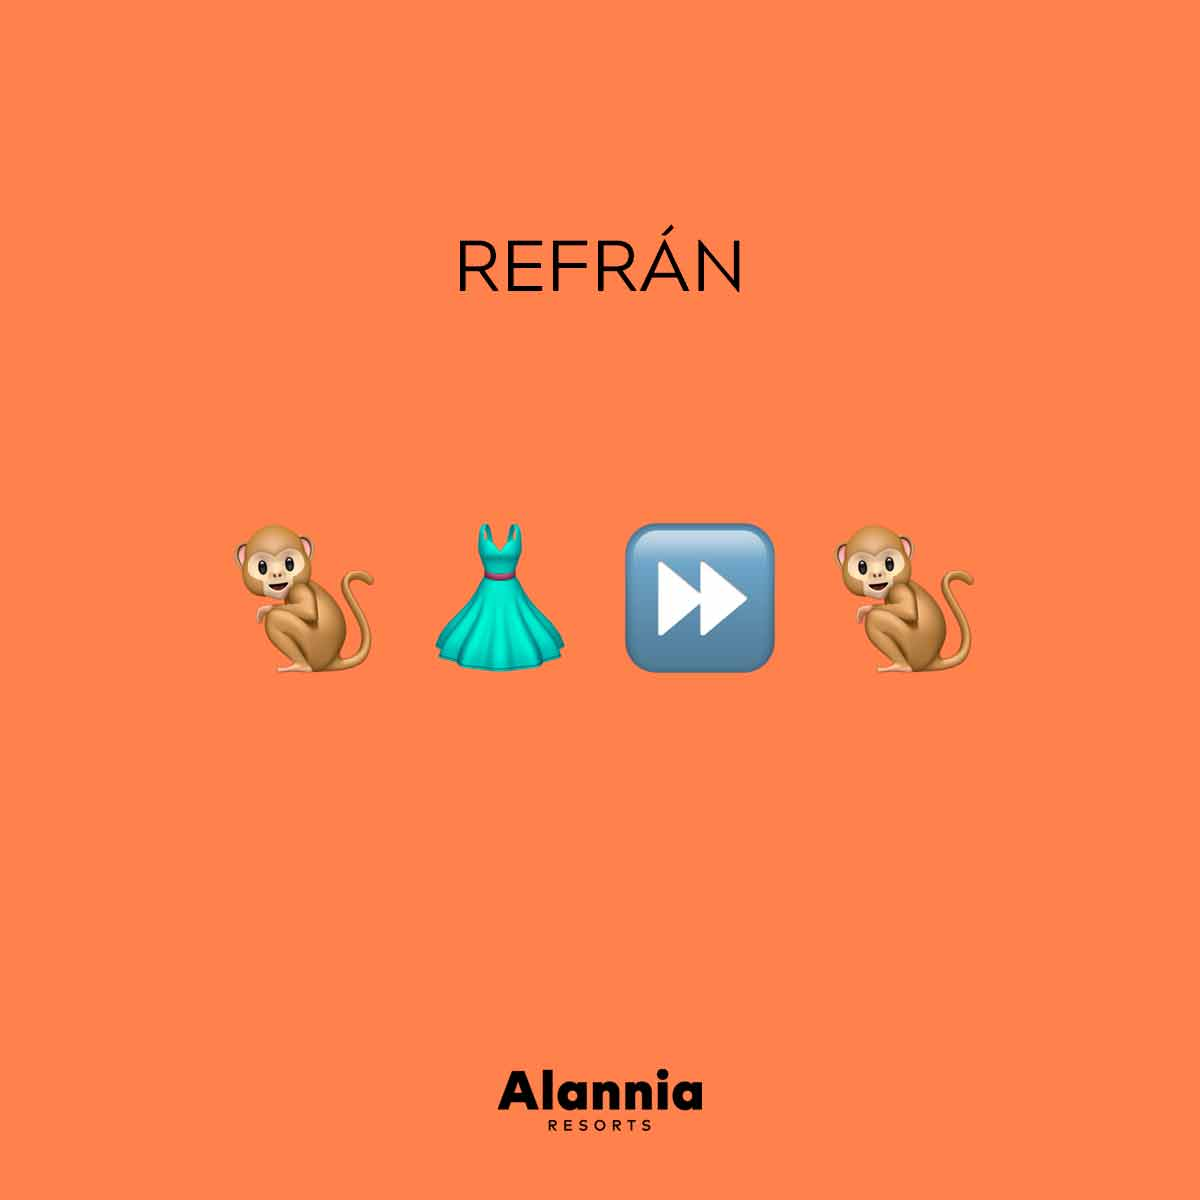 10 Acertijos Dificiles Para Resolver En Familia Blog Alannia Resorts